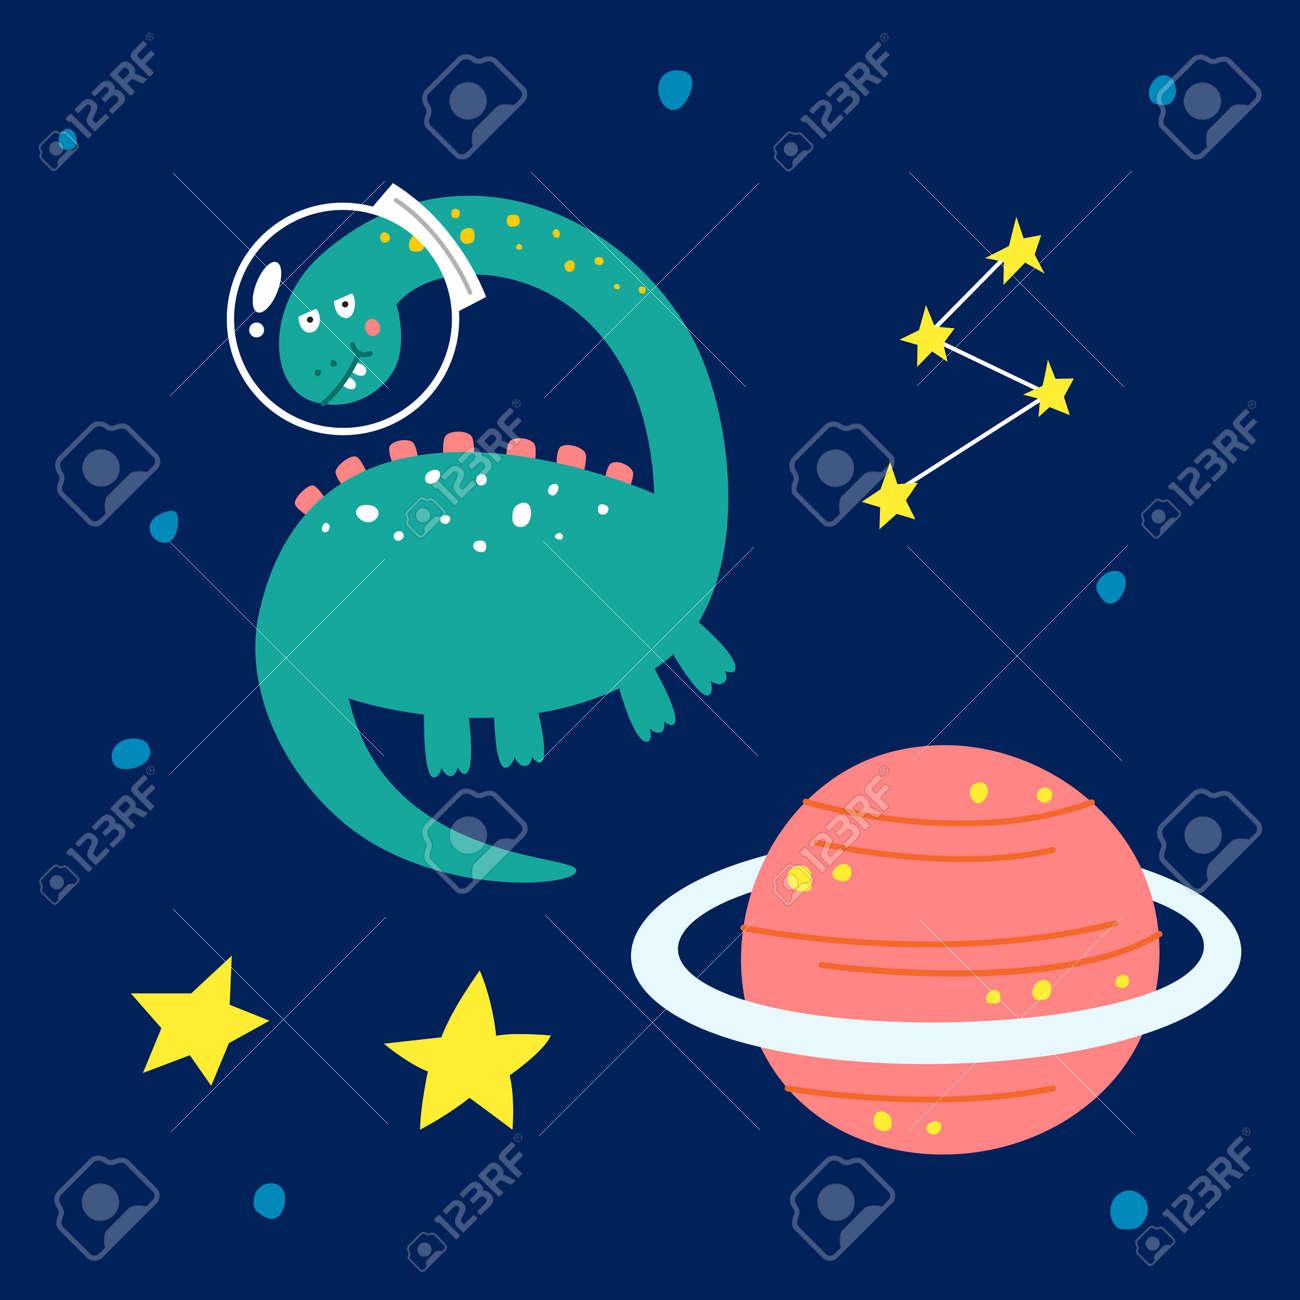 Space dinosaur, vector illustration for children fashion. - 169772193